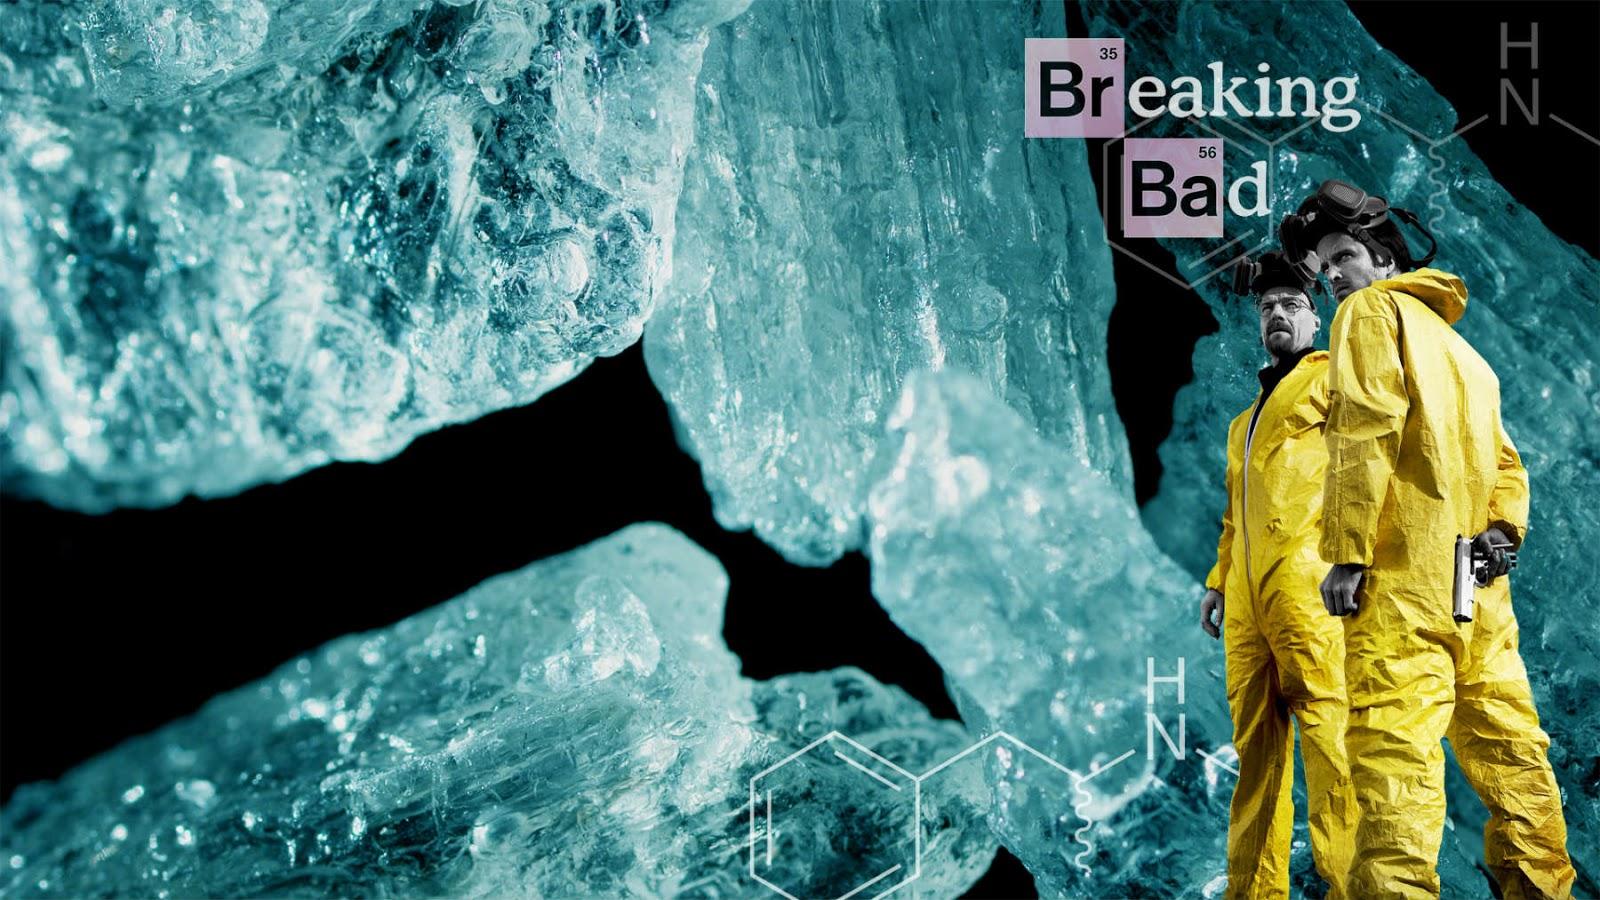 Breaking Bad Fansite Breaking Bad Blue Crystal Wallpaper 1600x900